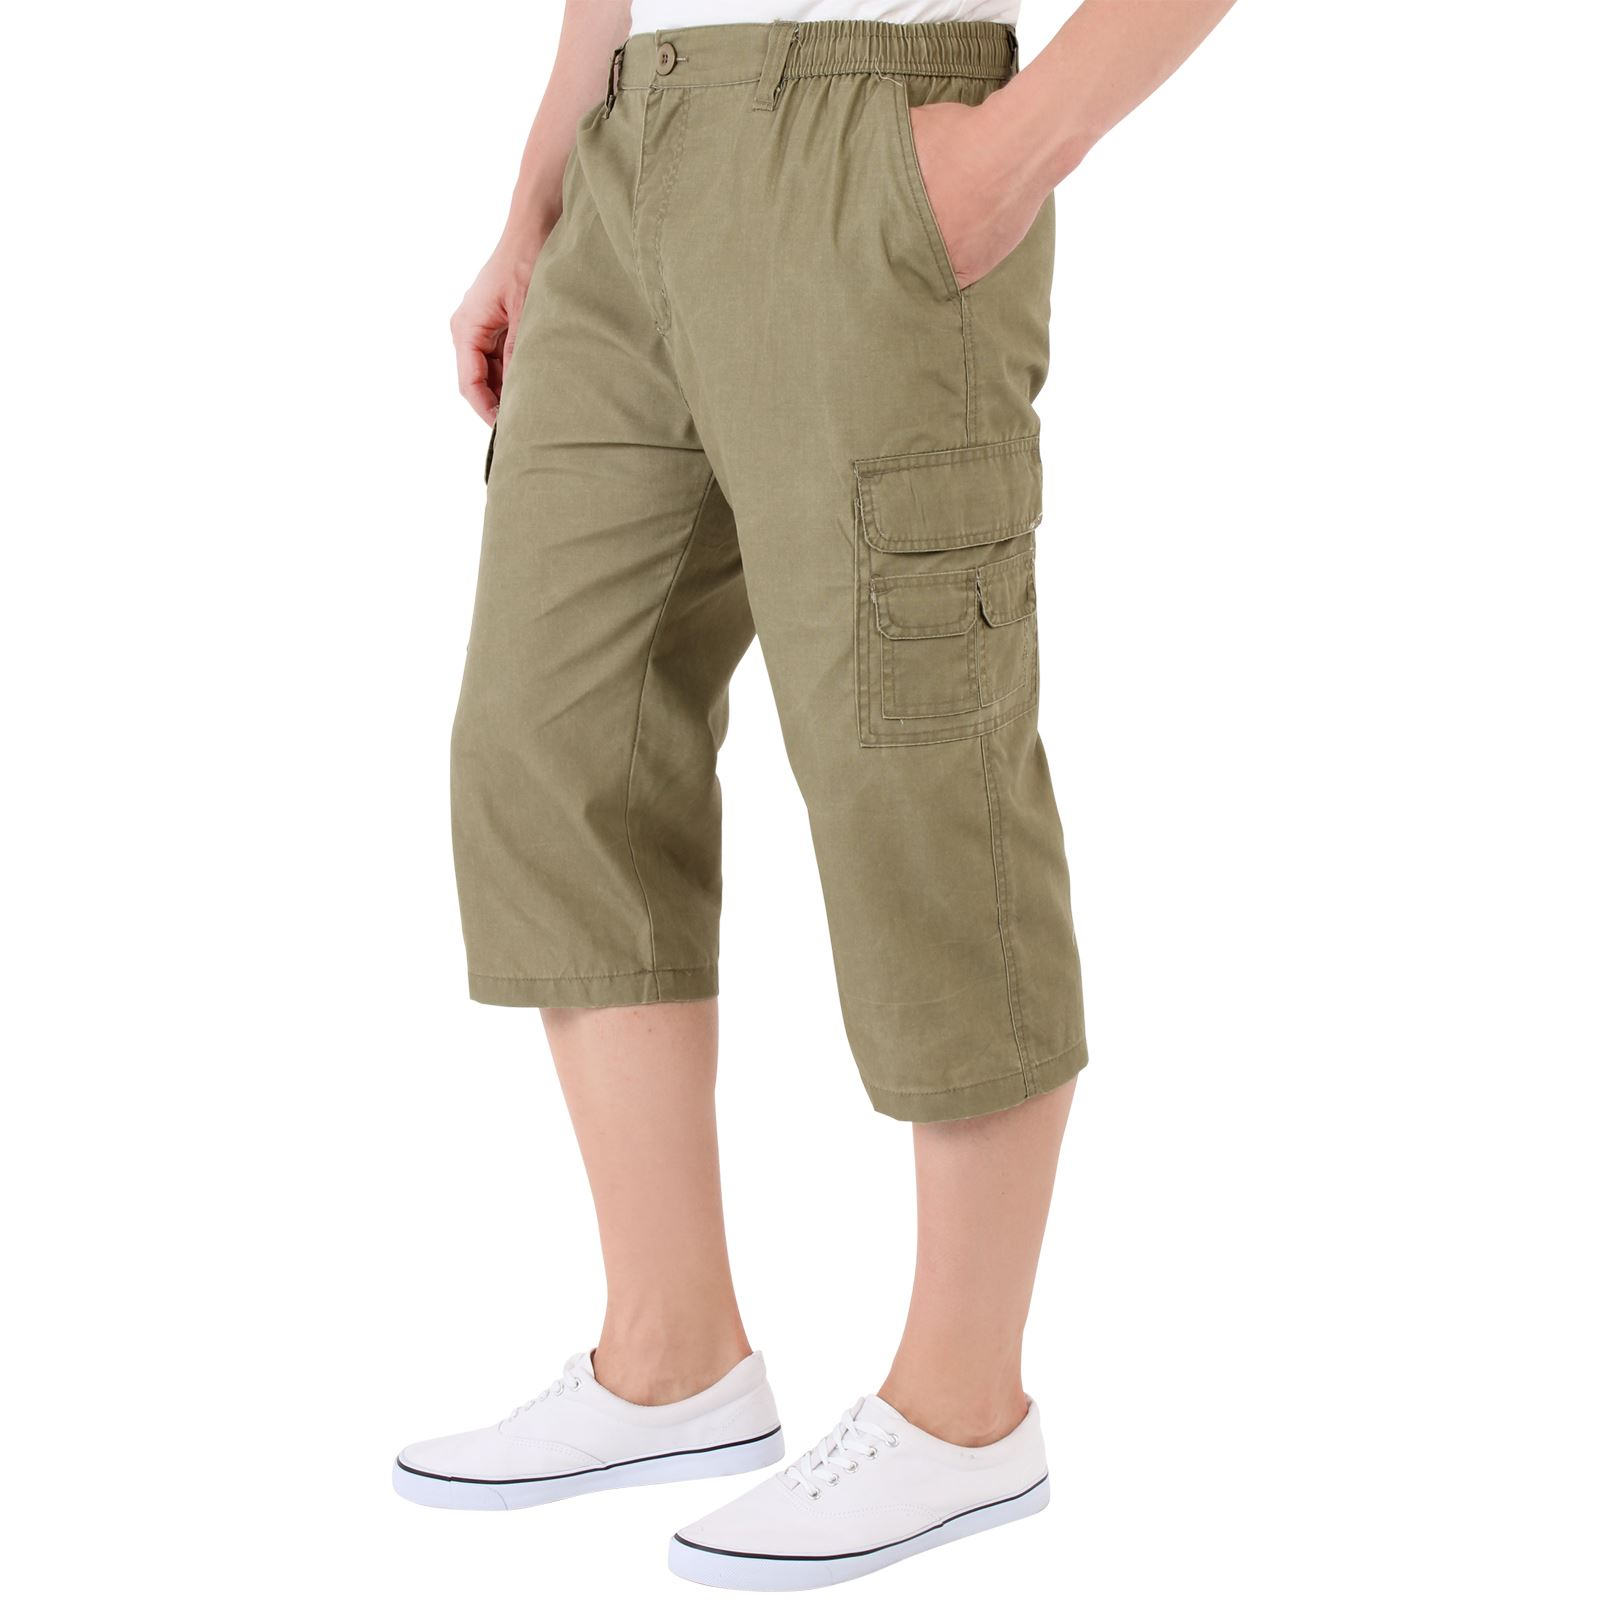 herren cargo bermuda capri shorts kurze hose sommerhose. Black Bedroom Furniture Sets. Home Design Ideas